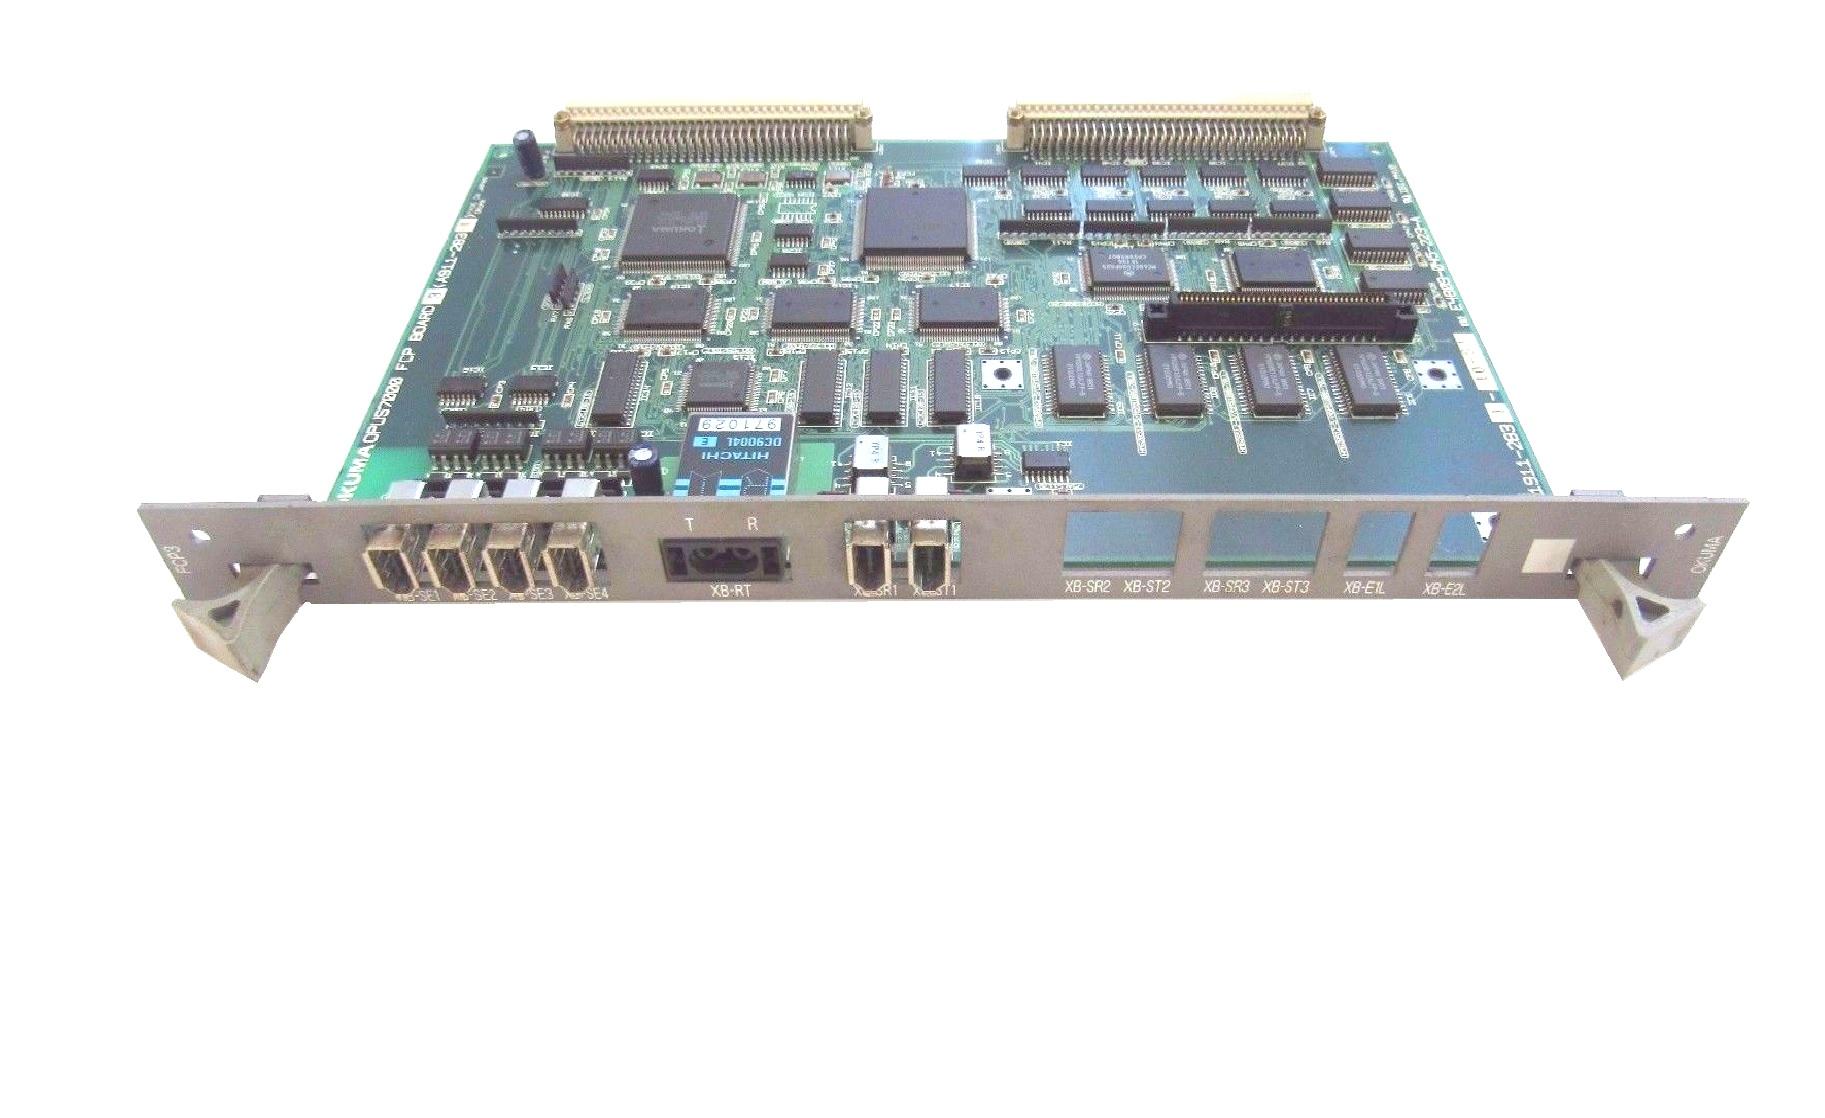 E4809-045 Circuit and Control Boards